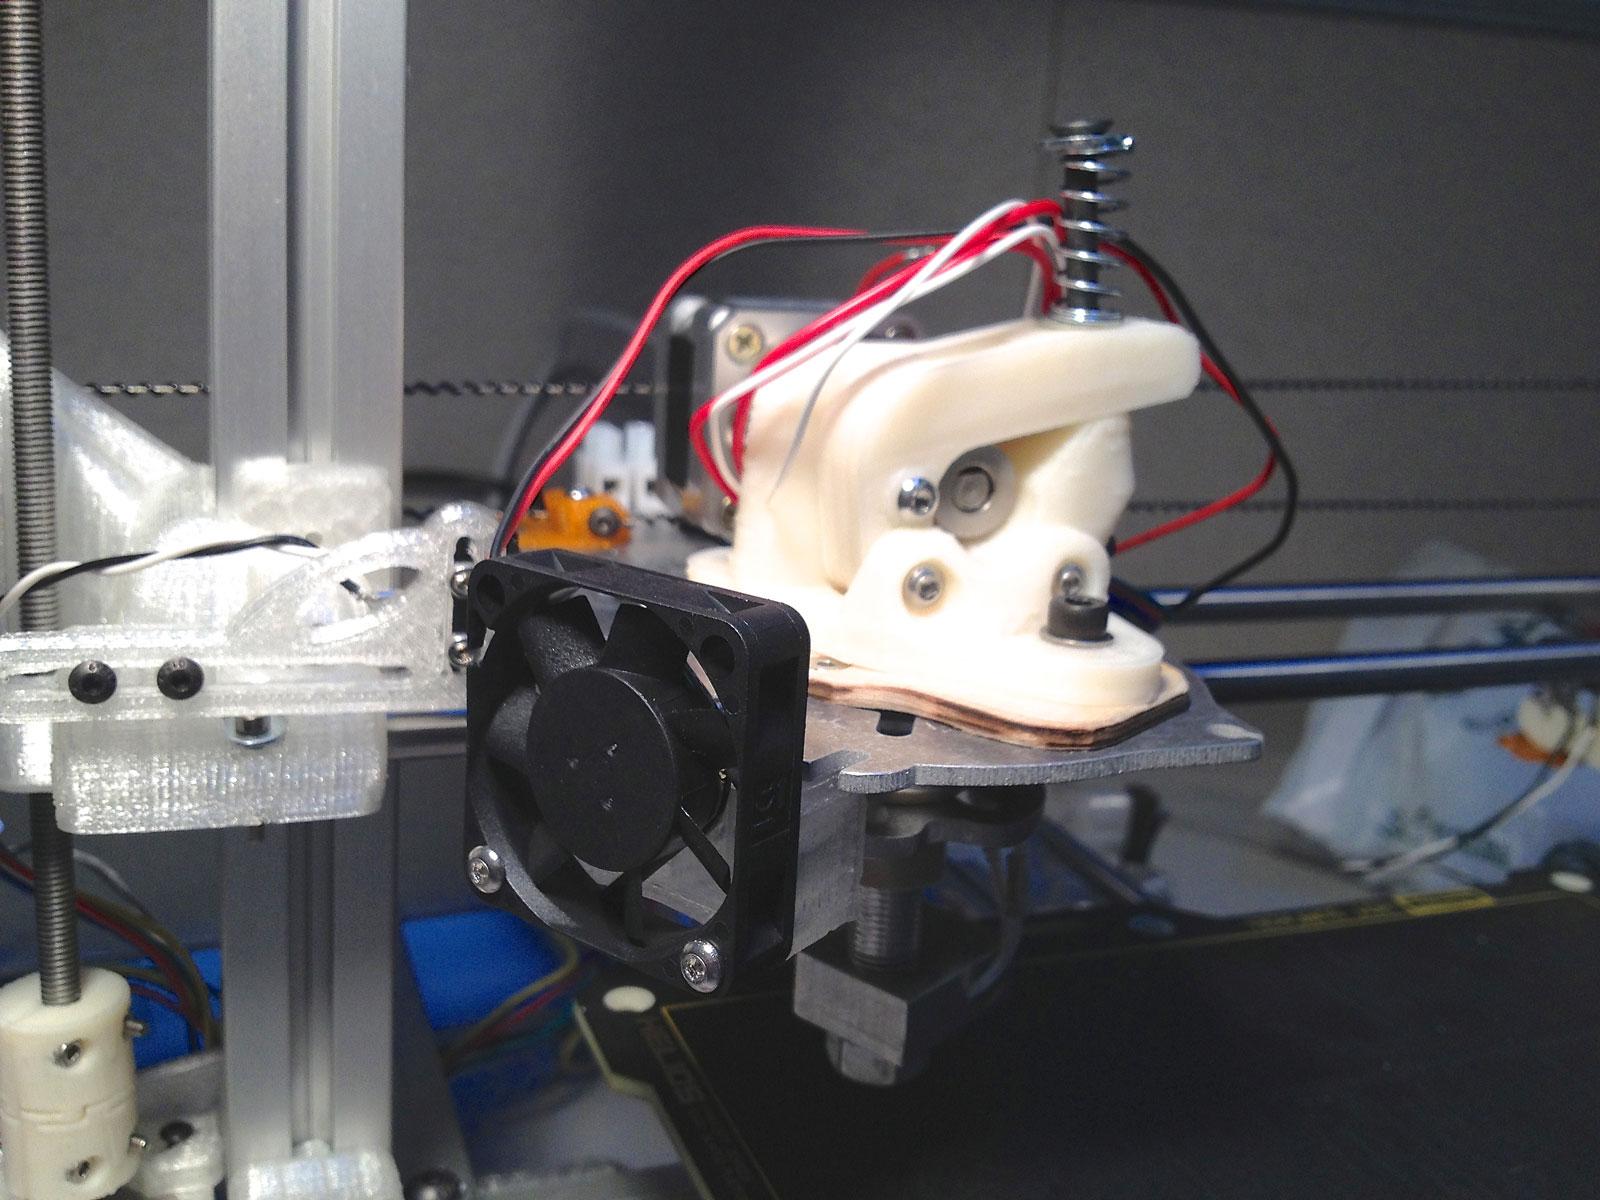 jitsbuild-wires [Bukobot 3D Printer Instructions & Docs]